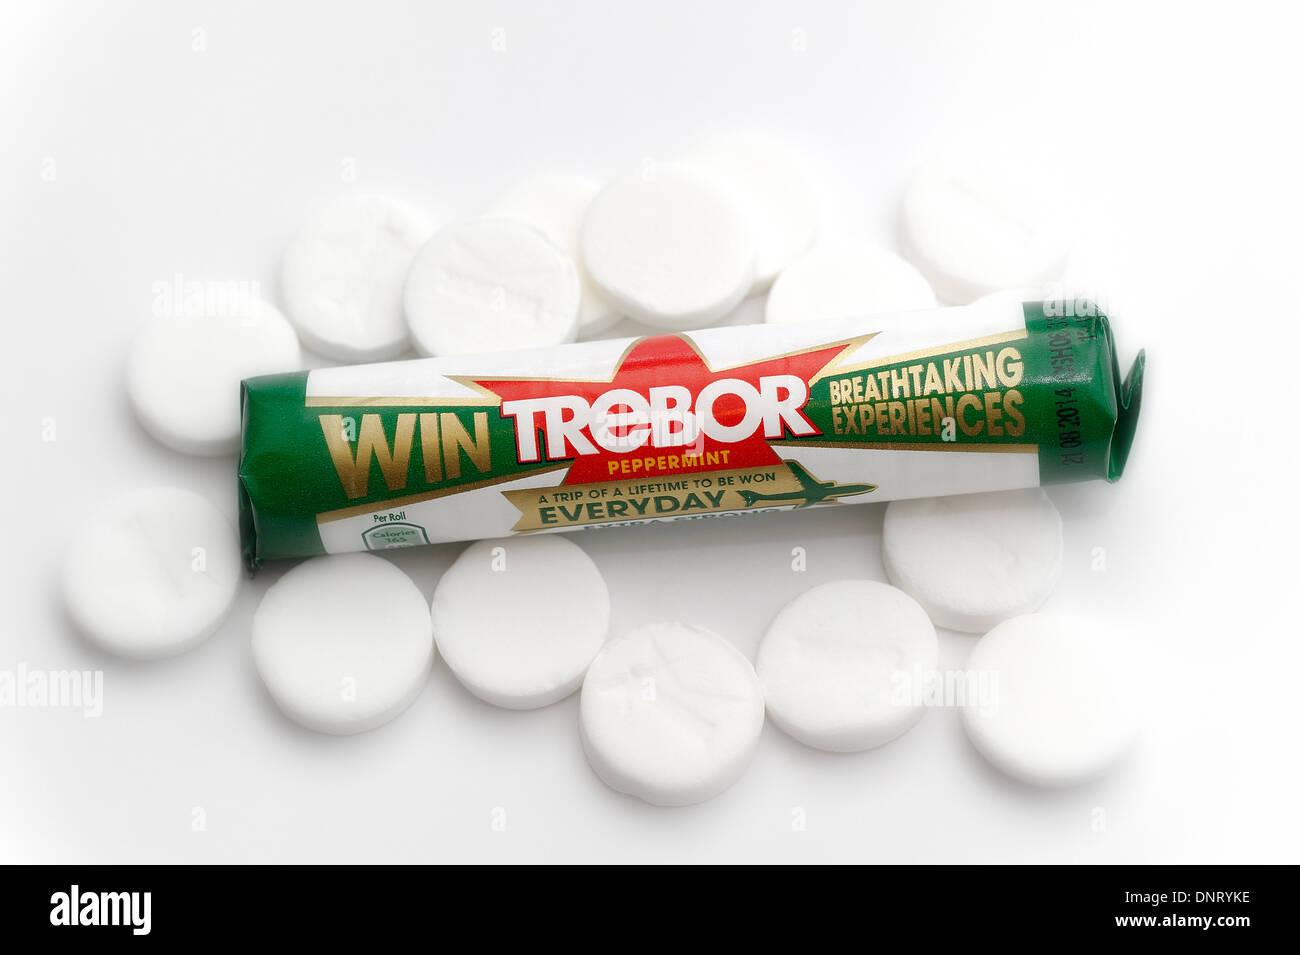 Trebor extra strong mints robert backwards retail pack tube - Stock Image